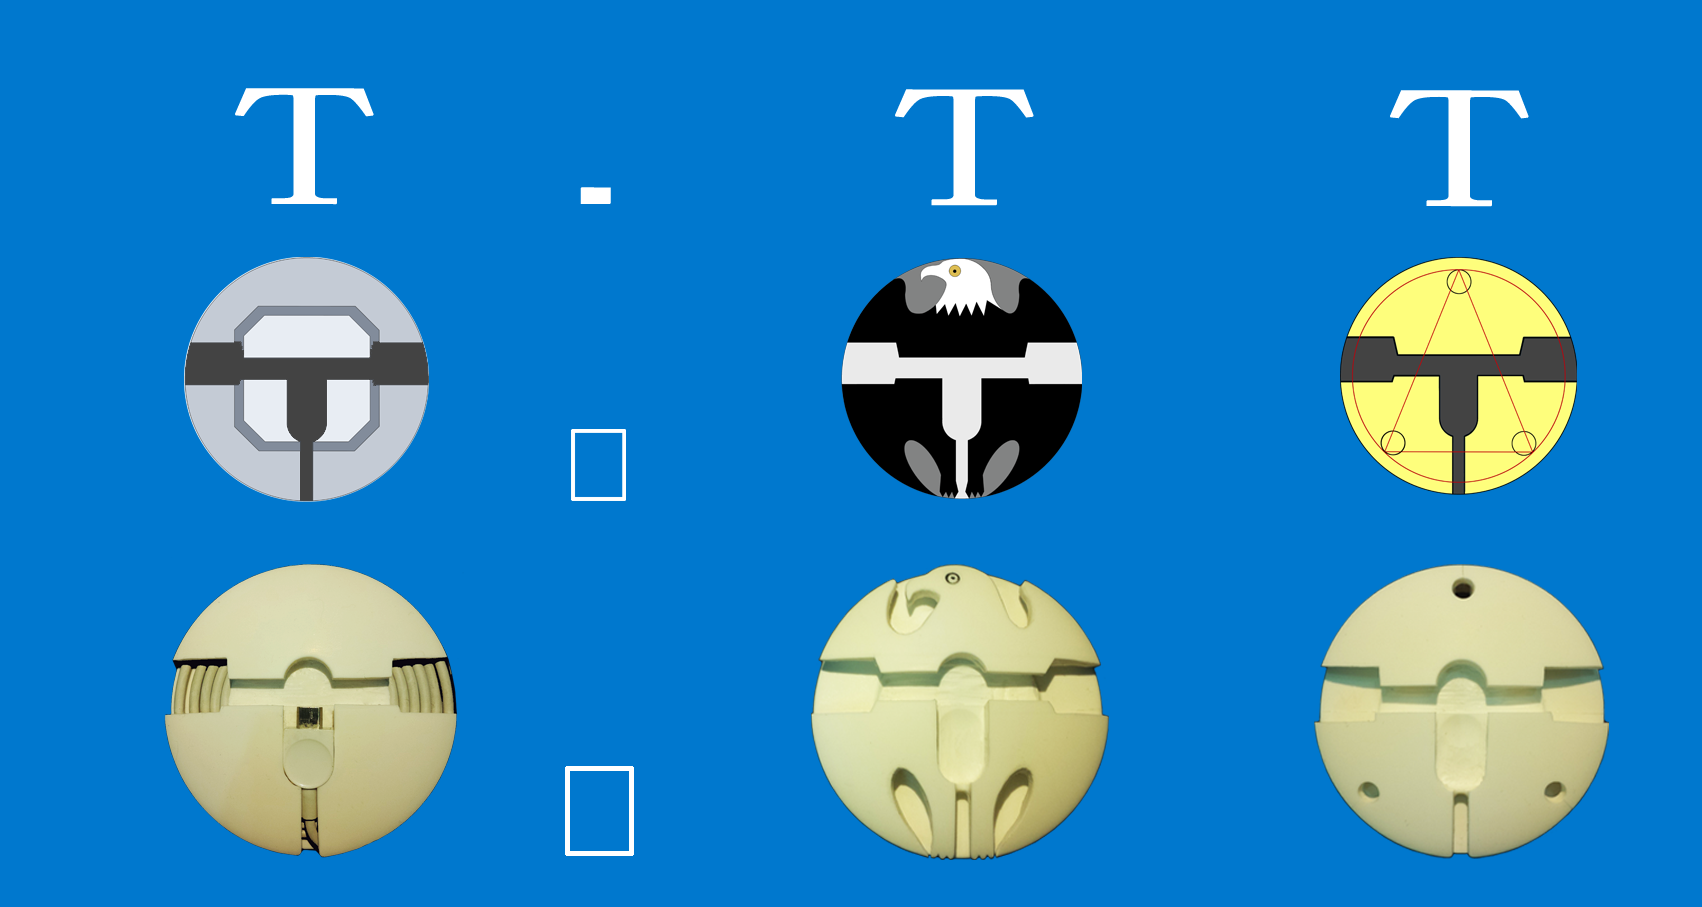 T T T P图2-3  (12) 选用 2017-7-10.png